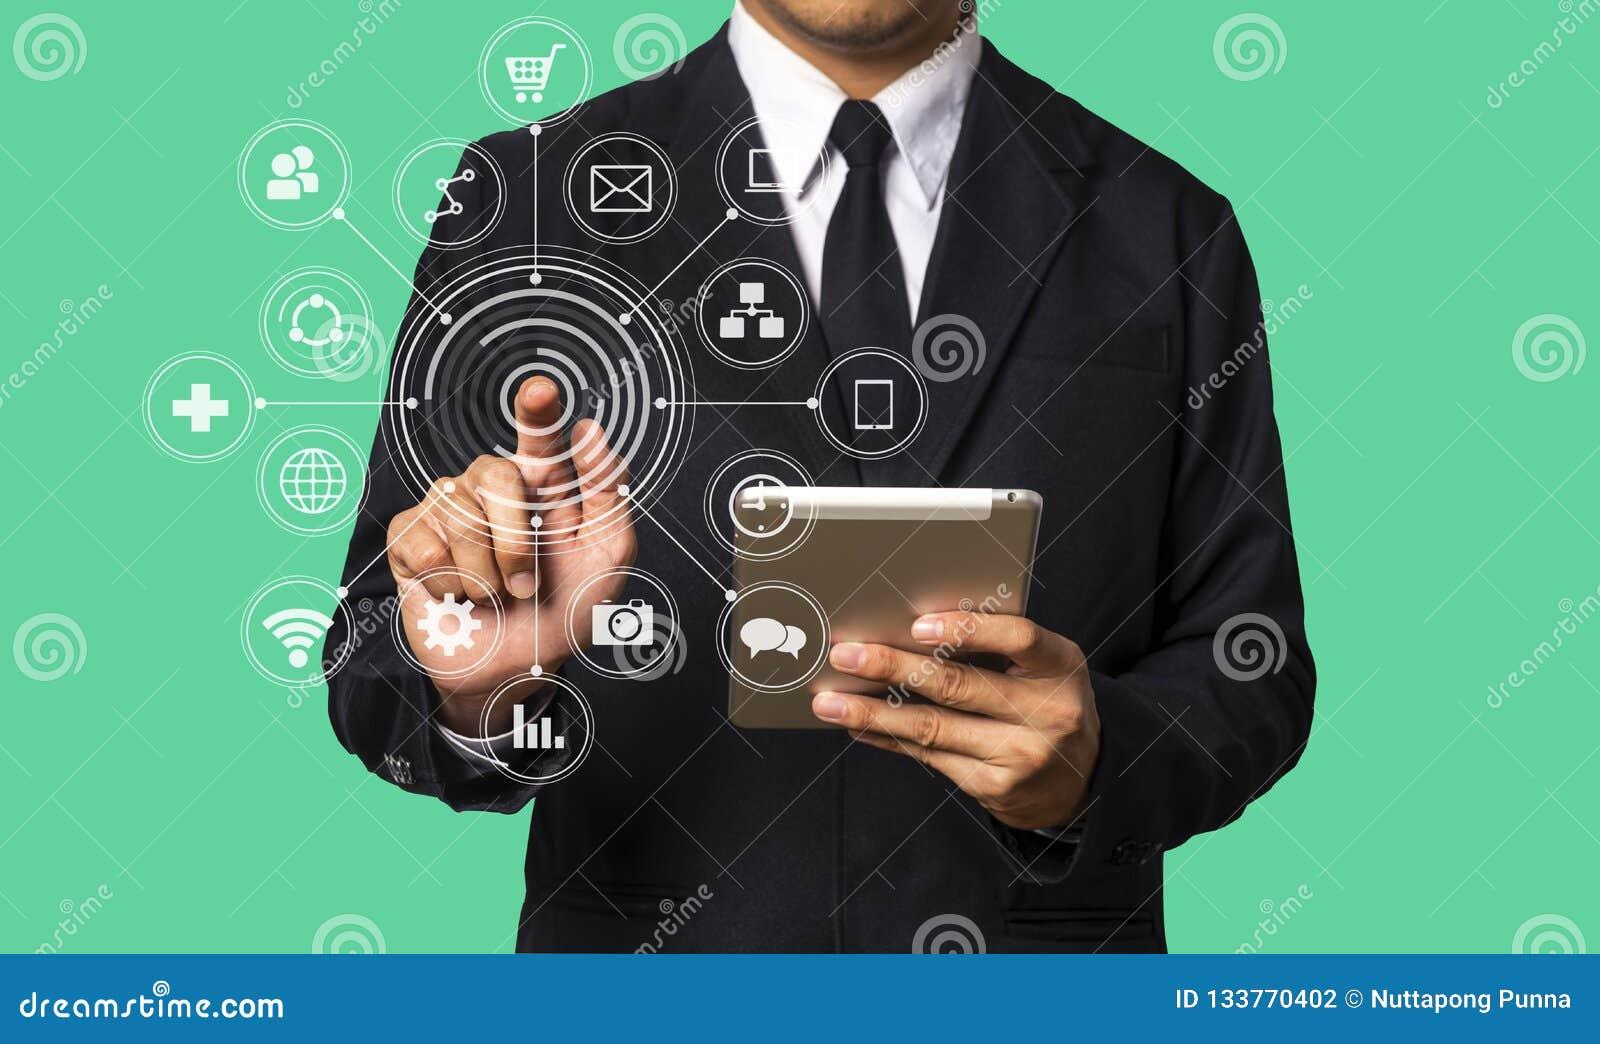 Digital marketing media in virtual screen.business